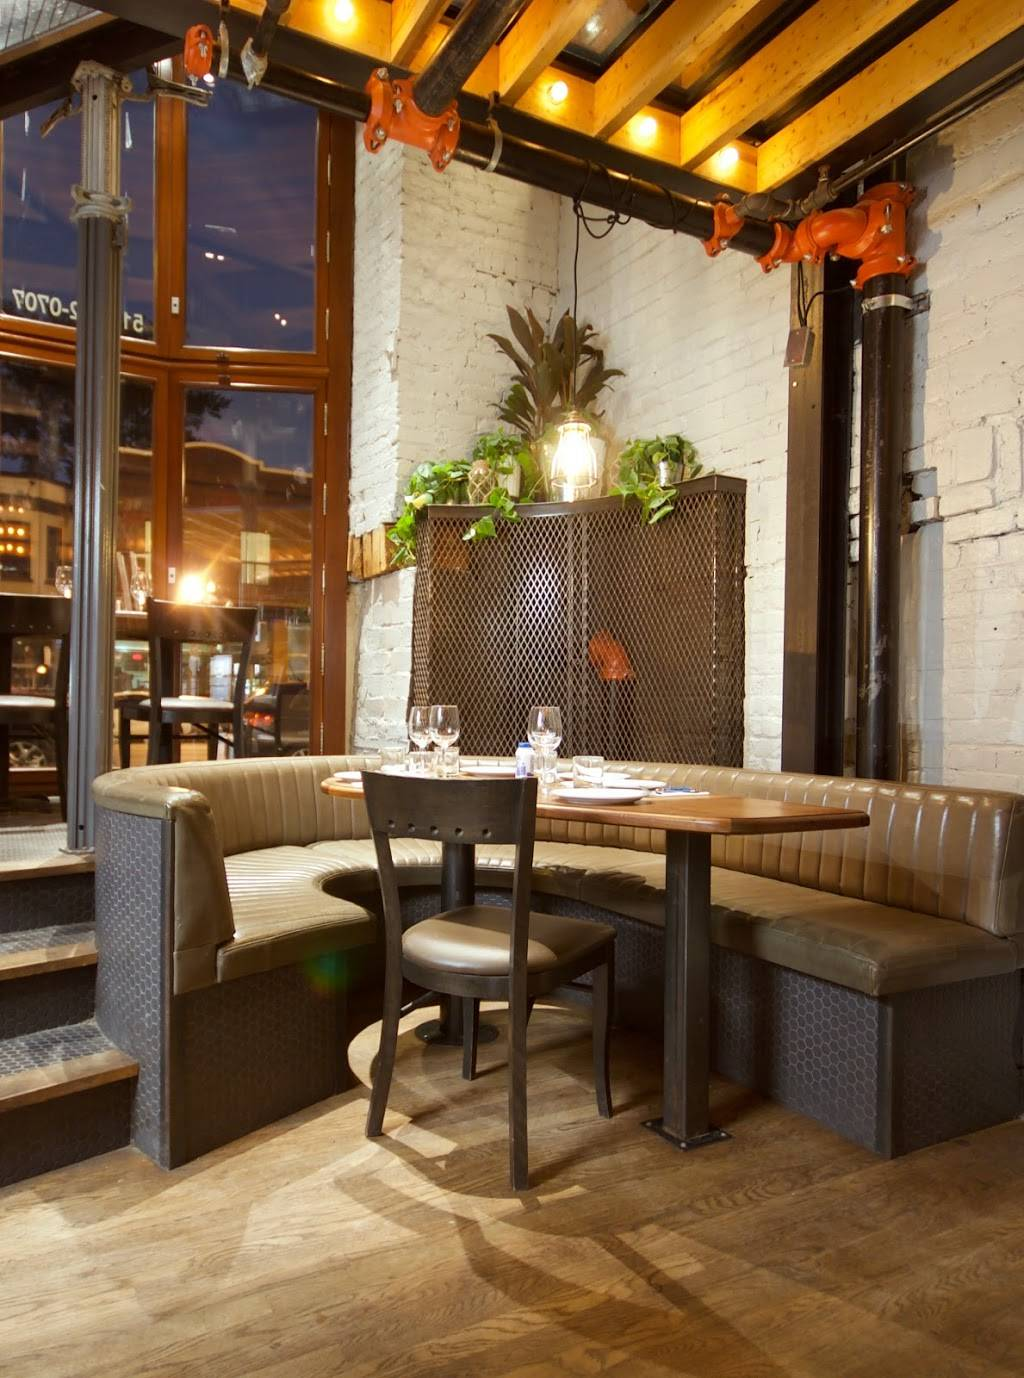 Estiatorio Kavos | restaurant | 4922 Rue Sherbrooke Ouest, Westmount, QC H3Z 1H3, Canada | 5144820707 OR +1 514-482-0707